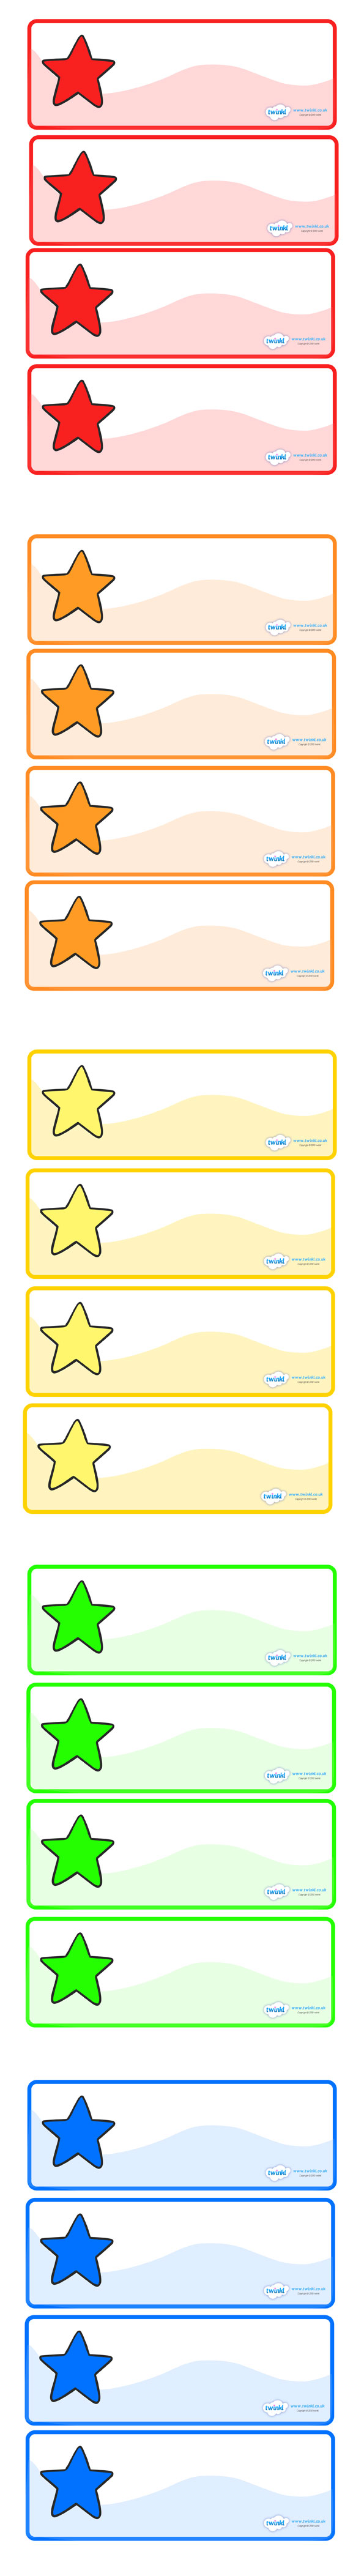 Twinkl Resources Drawer Peg Labels Stars Classroom Printables For Pre School Kindergarten Elementary School An Name Labels Classroom Name Tags Labels